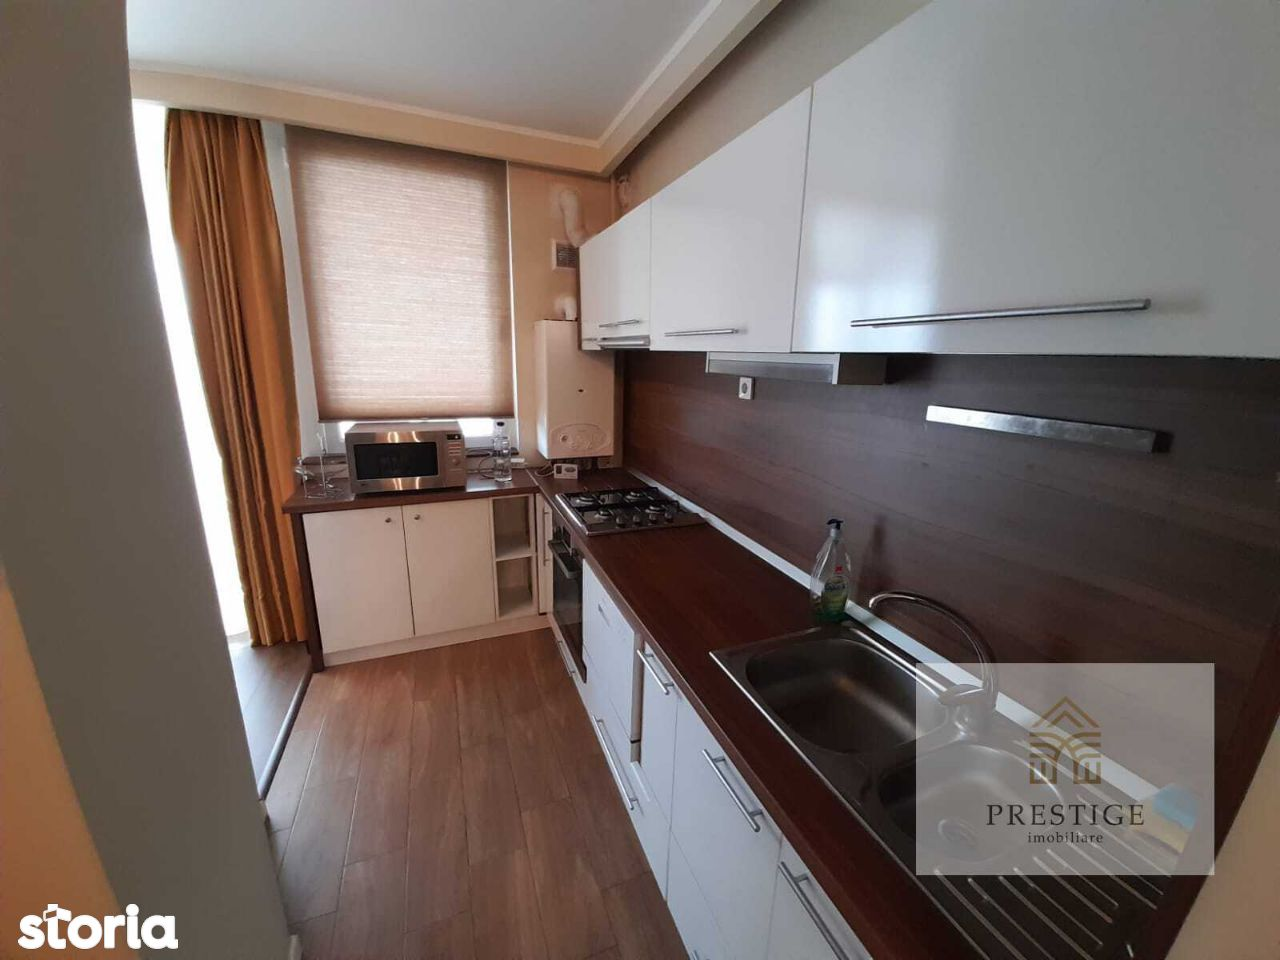 Apartament 3 camere de inchiriat in ARED, Oradea